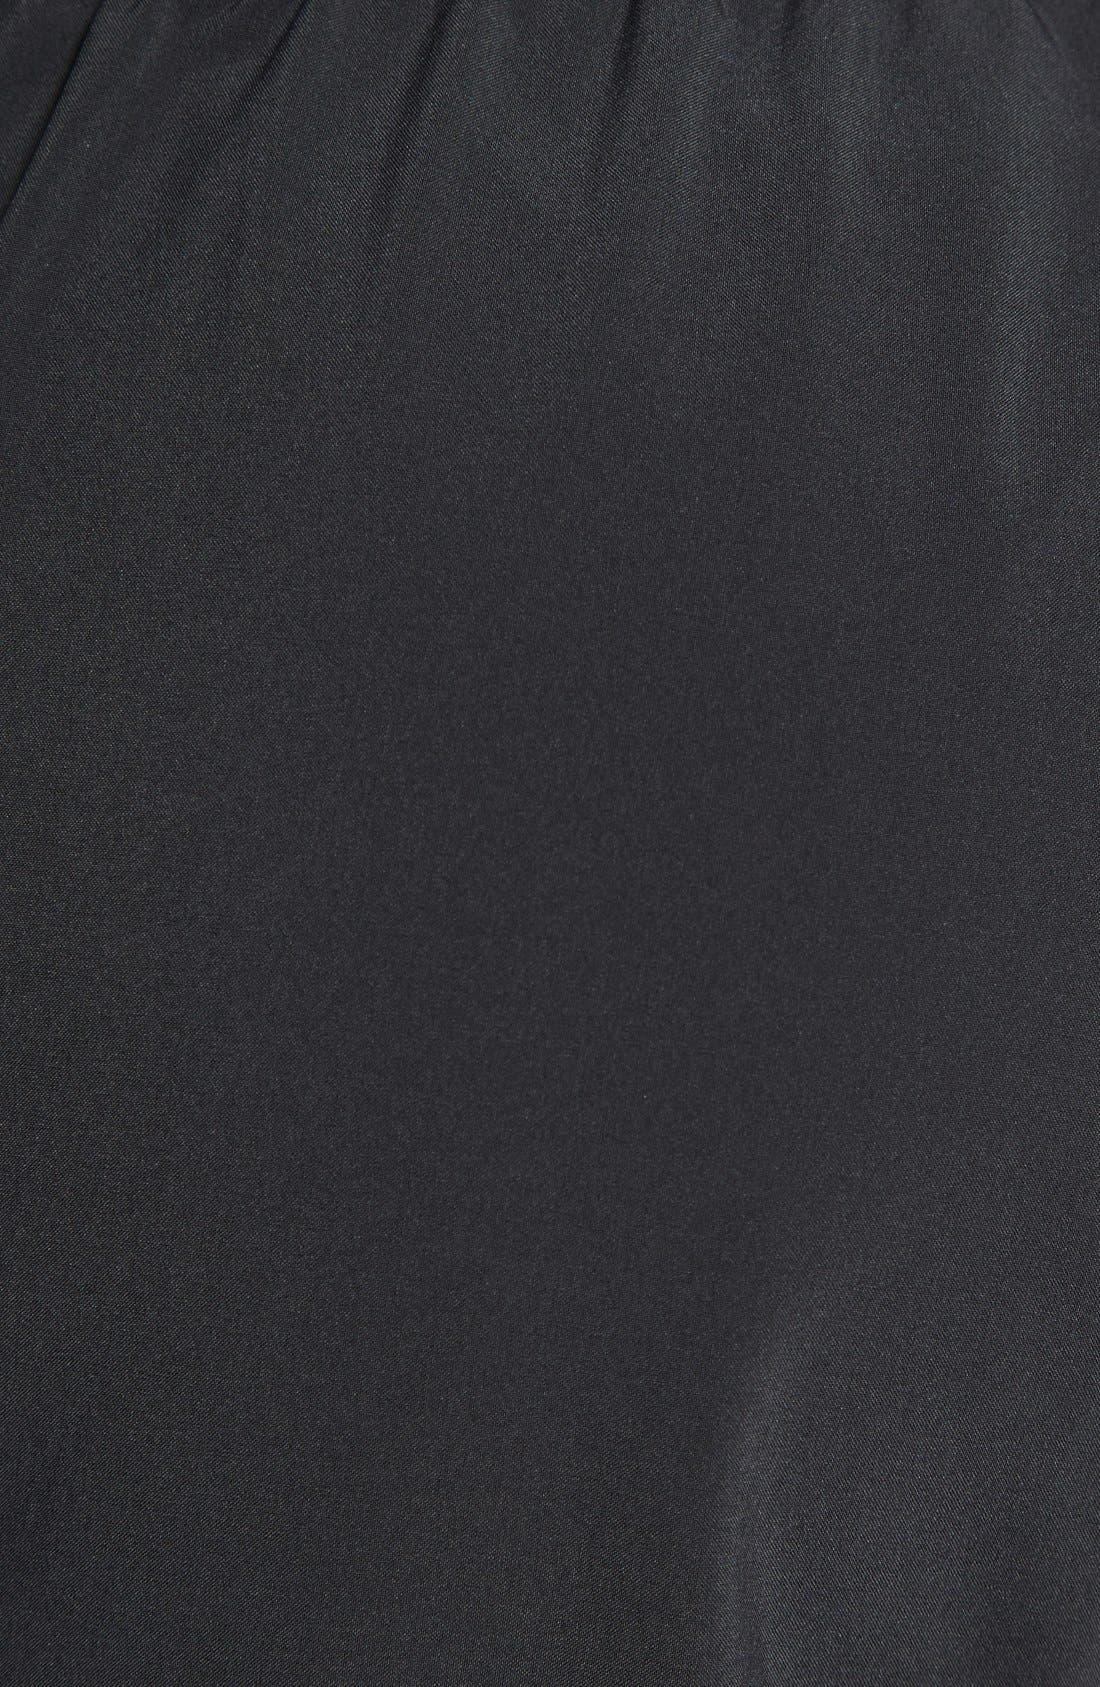 Alternate Image 3  - Nike Dri-FIT Woven Running Shorts